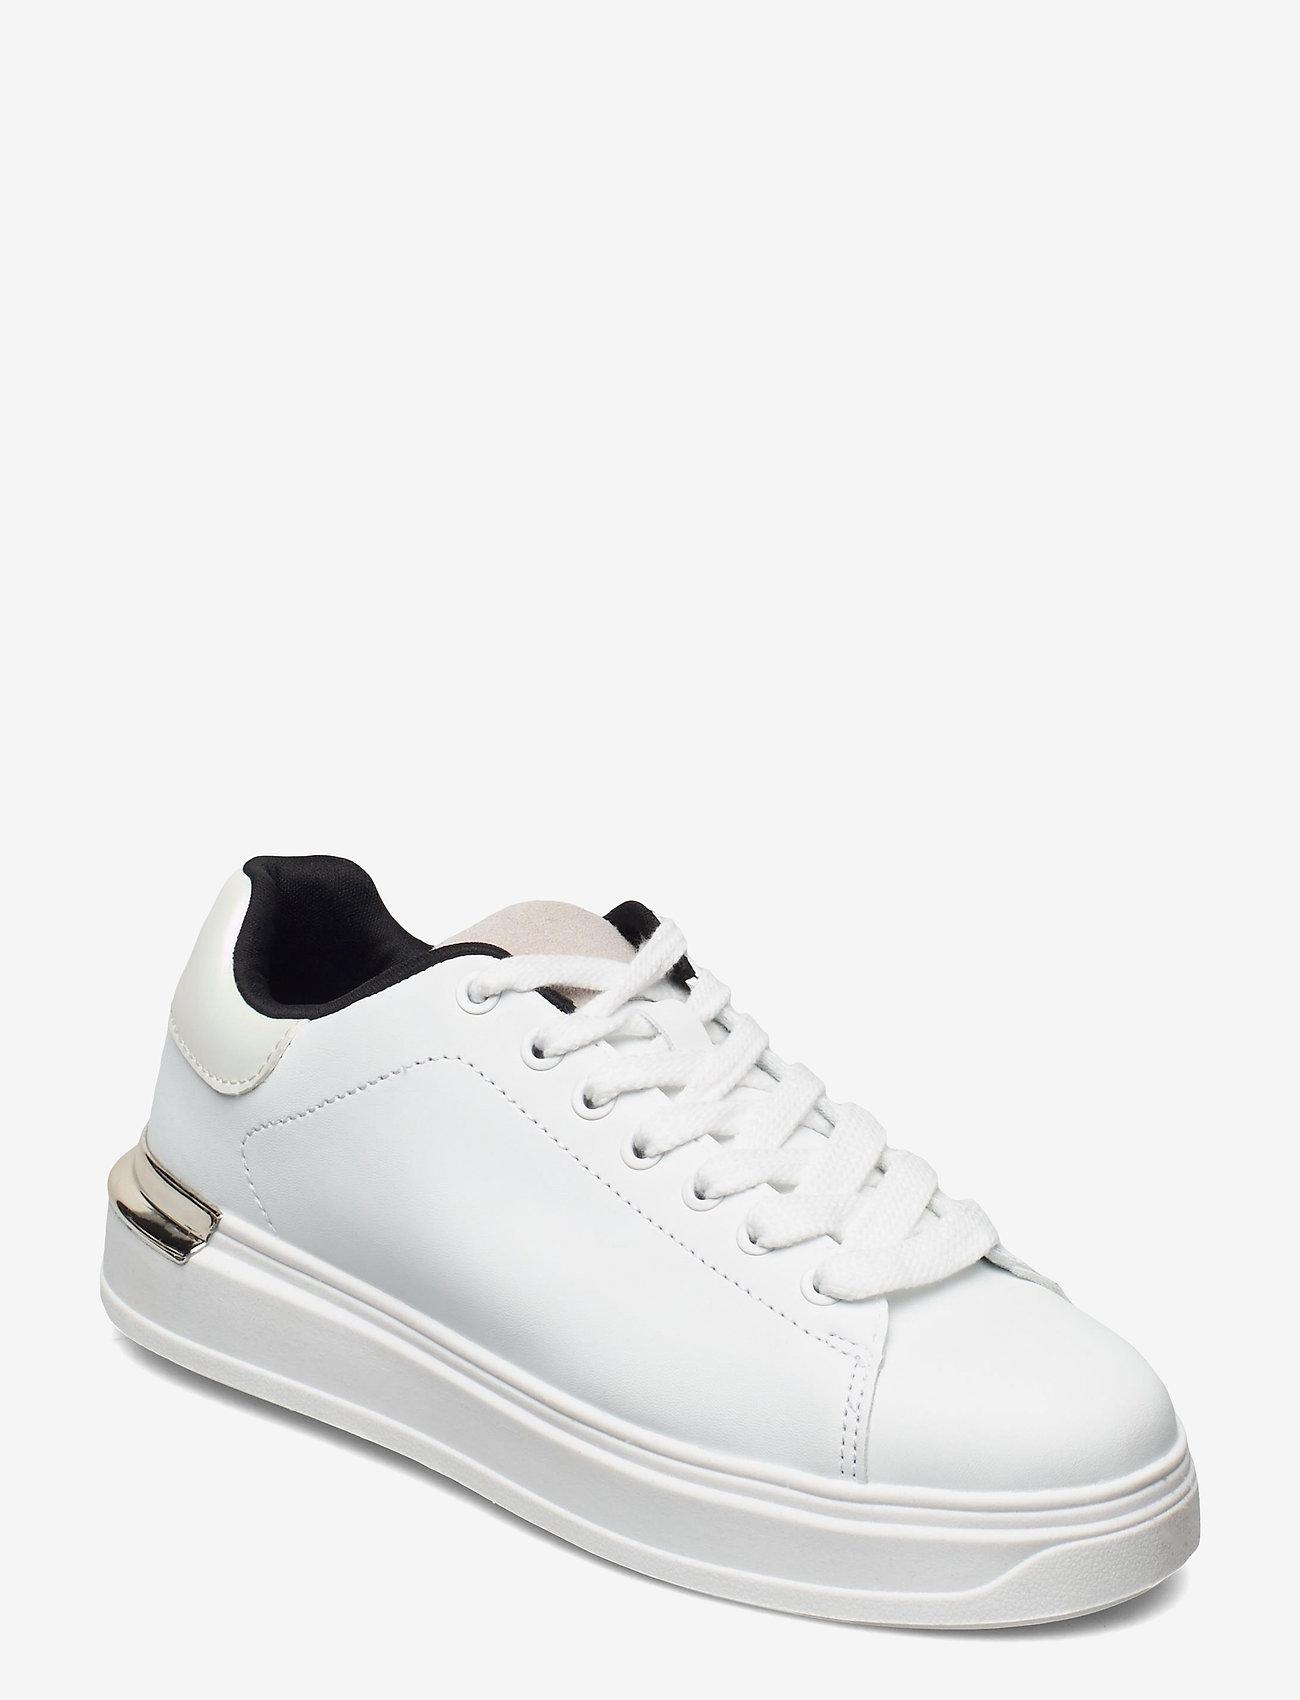 Vero Moda - VMMILANO SNEAKER - låga sneakers - snow white - 0